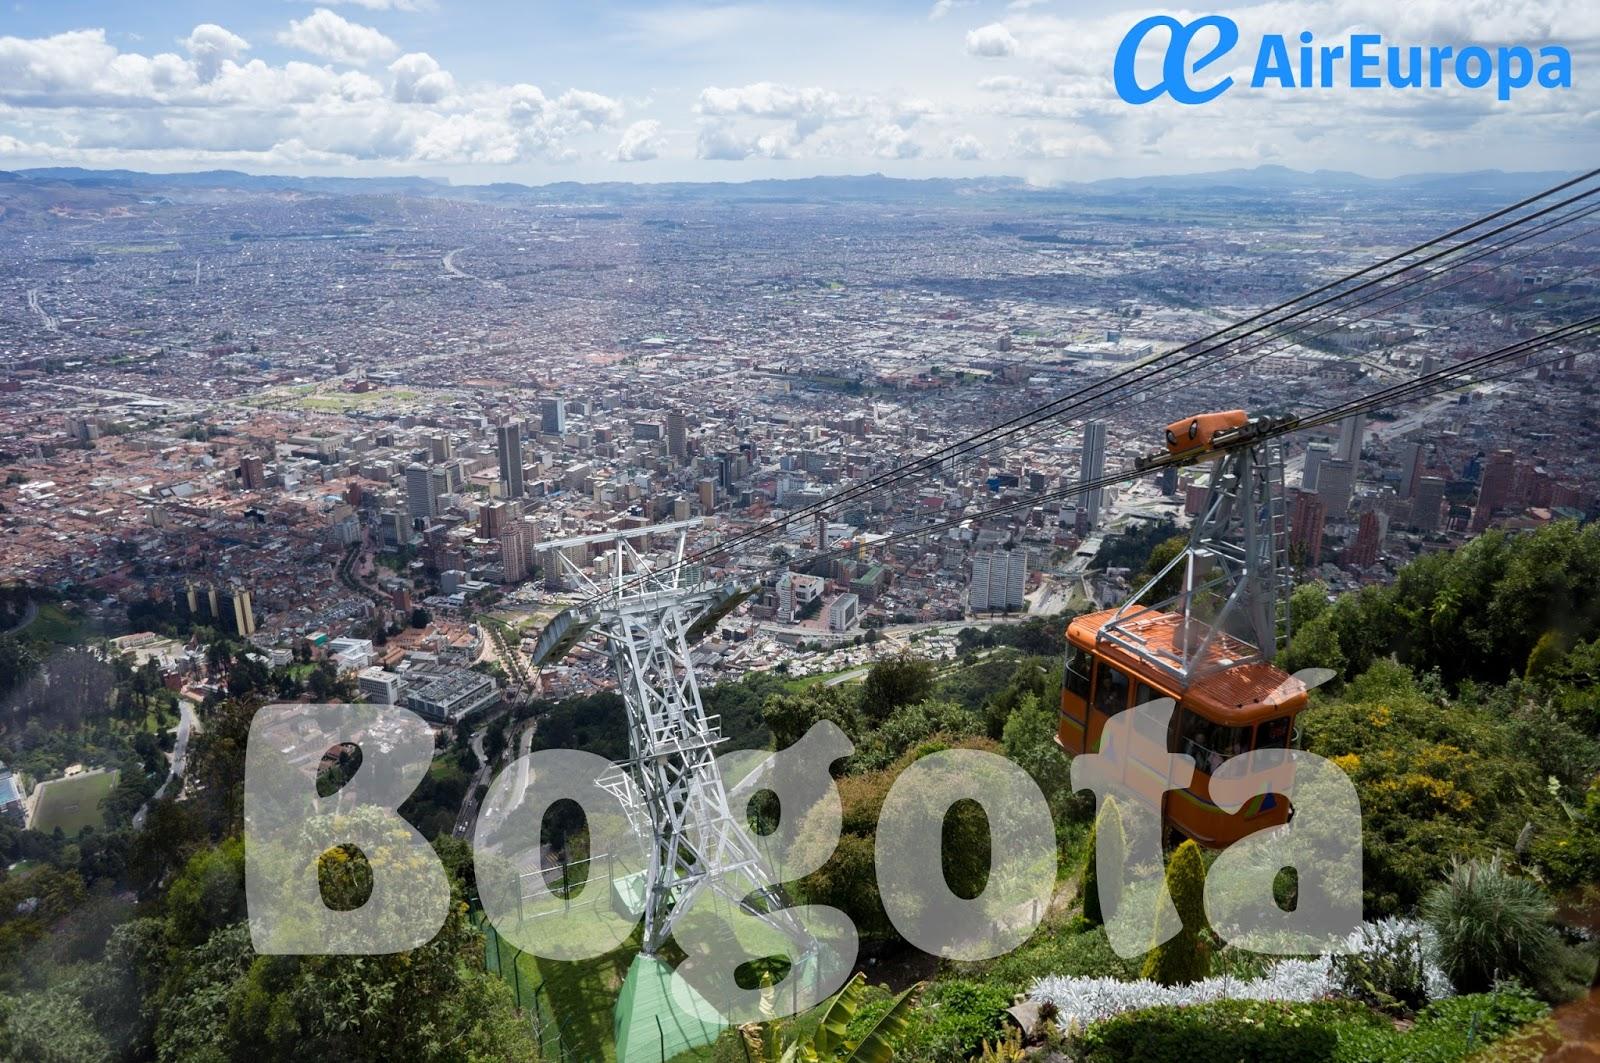 Aeropuerto de vigo blog enconexi n bogot desde 300 con air europa - Vuelos puerto asis bogota ...